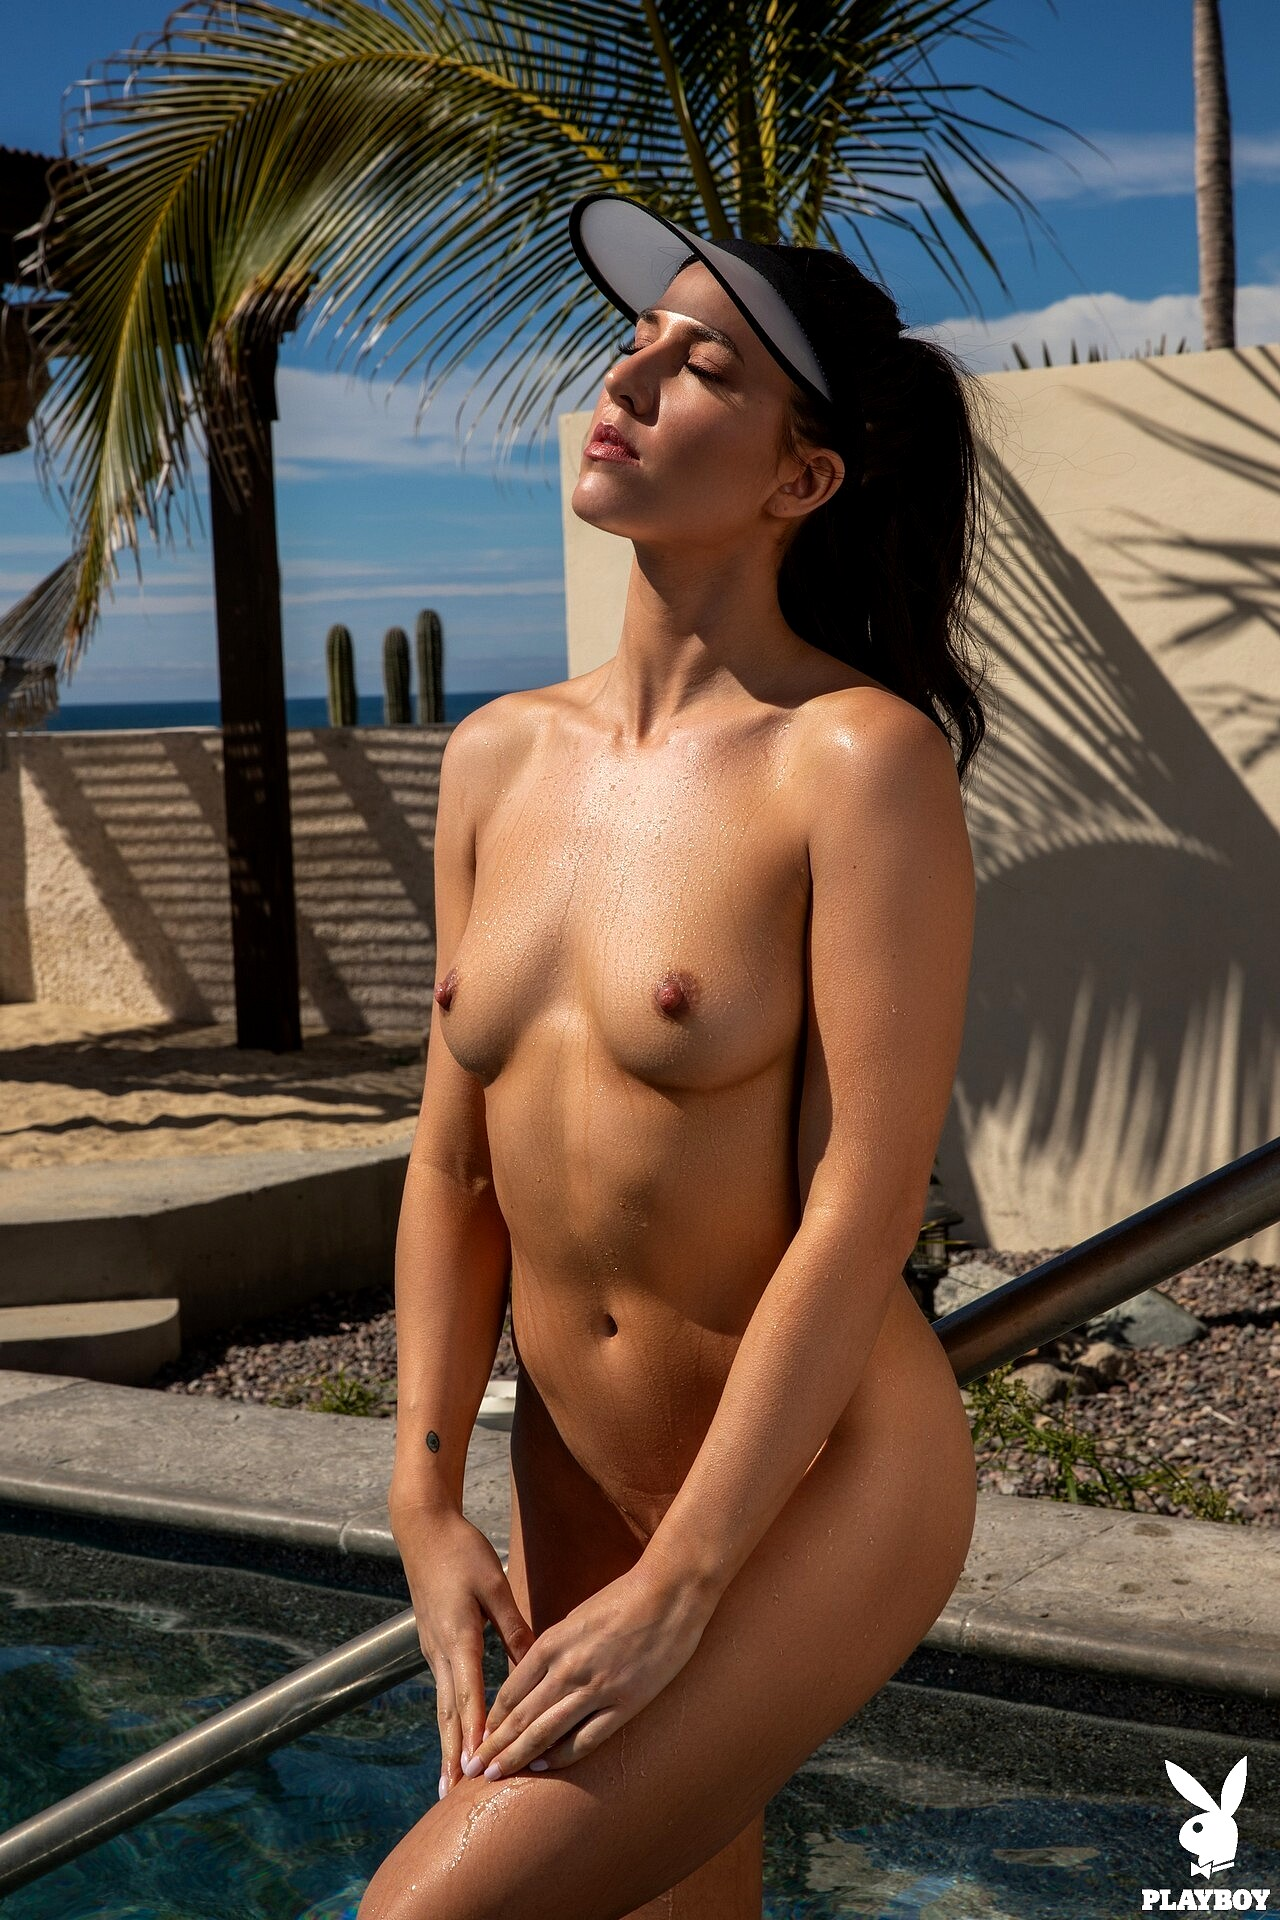 Babe Today Playboy Plus Carmen Nikole Edge Poolside Free Video Porn Pics-1628